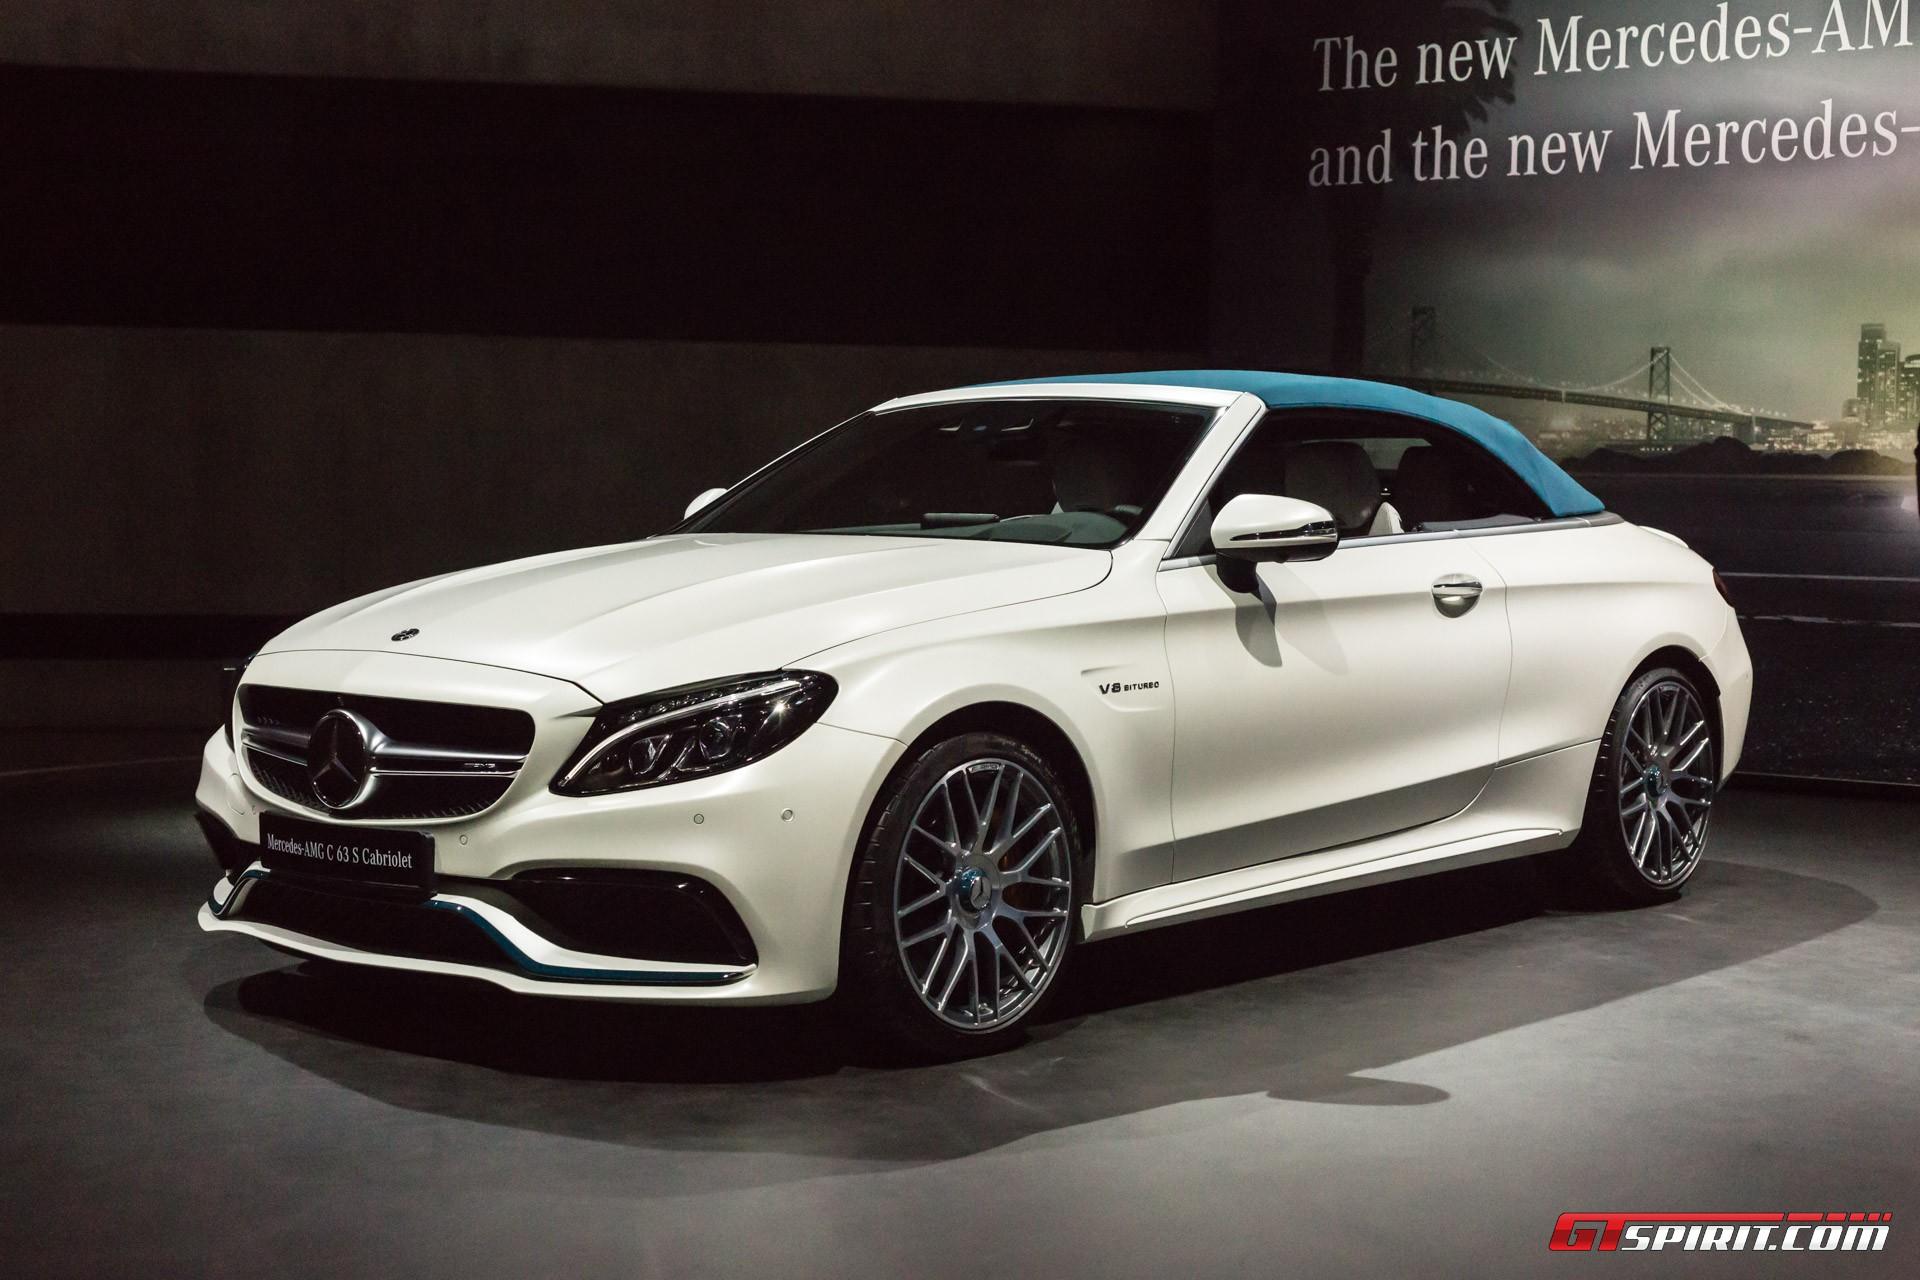 Mercedes-Benz AMG C63 S Ocean Blue Edition Geneva 2017